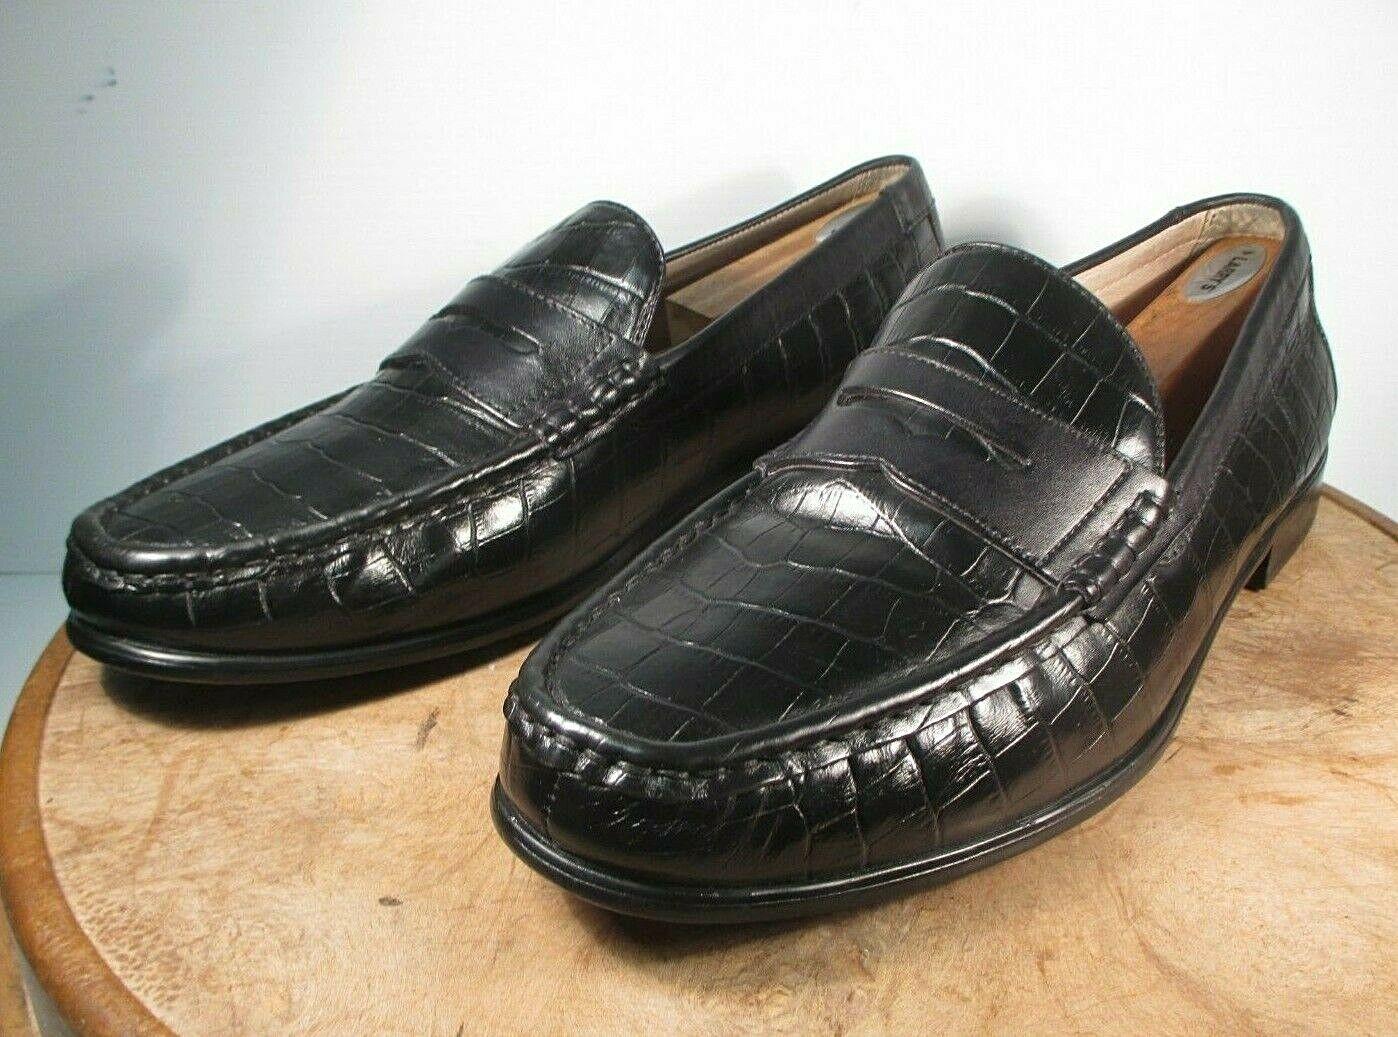 Domani Ballard Black Leather Crocodile Print Penny Loafers size 13 M